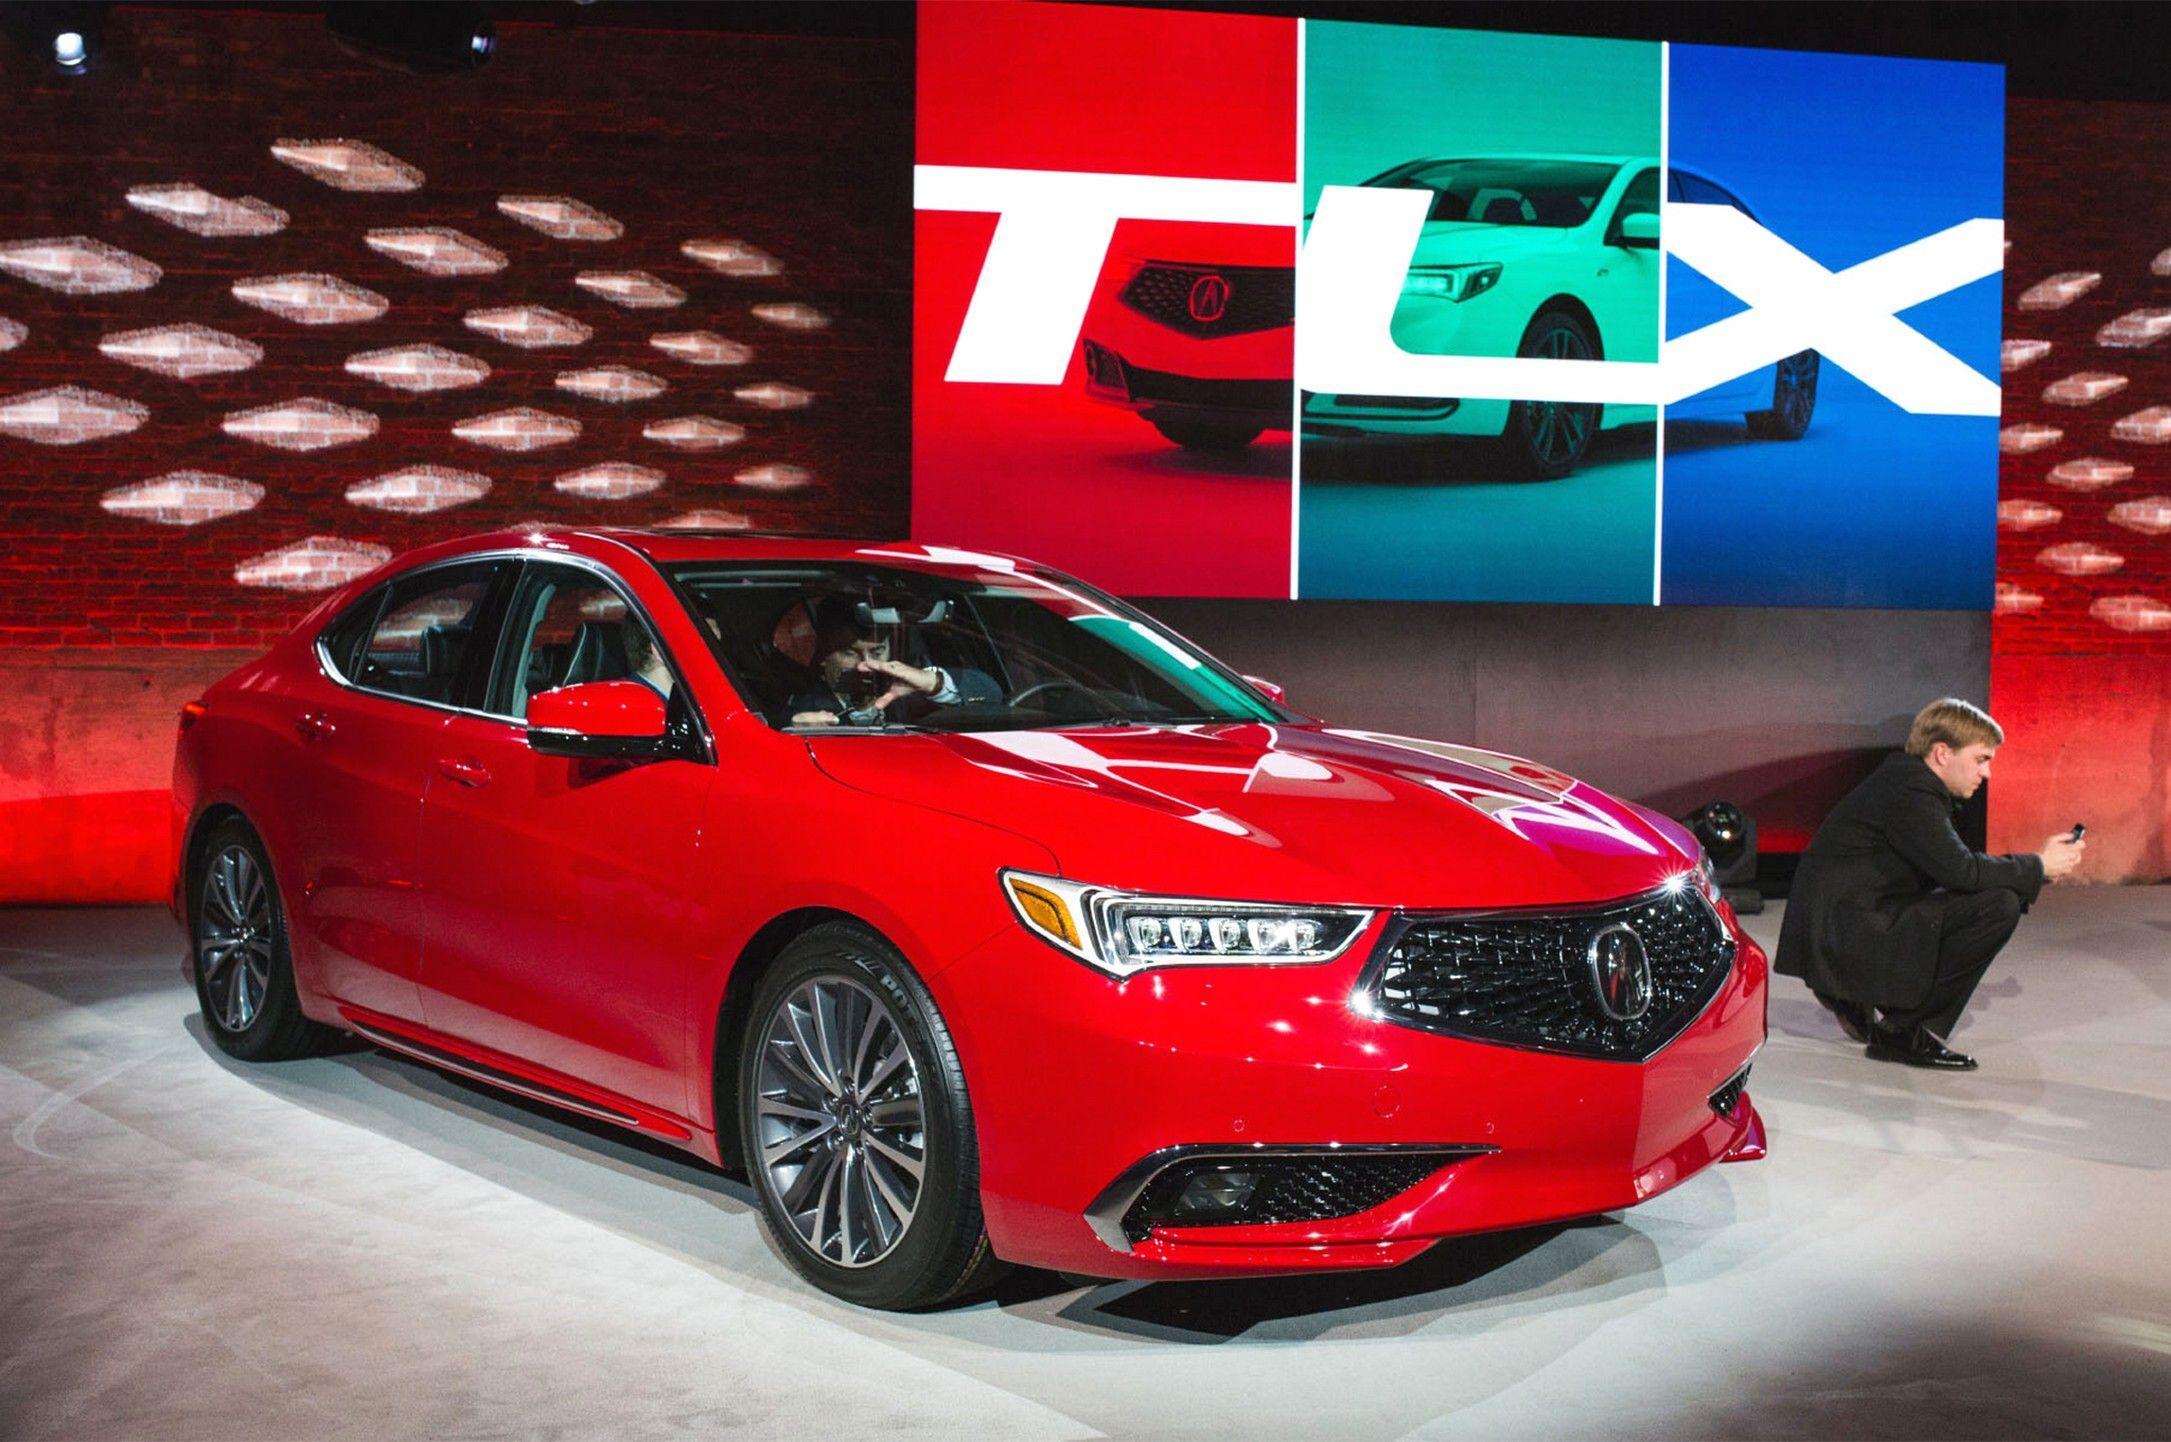 2018 Acura Tlx A Spec Red Kueli Acura Tlx Acura New Cars